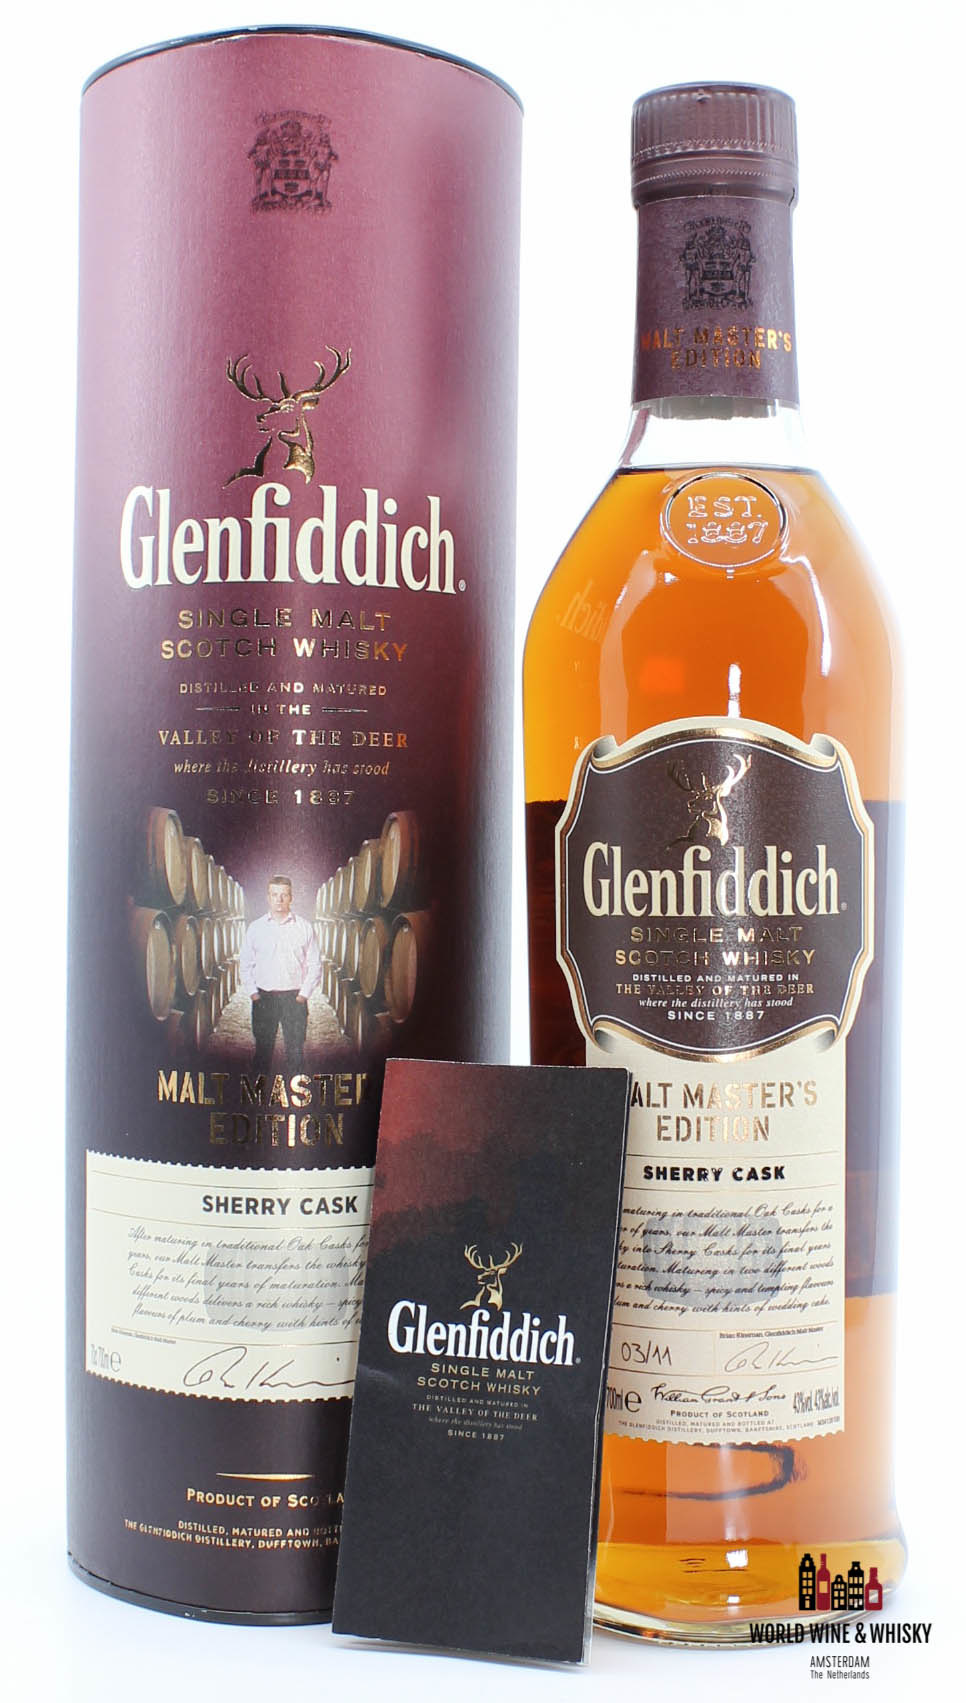 Glenfiddich Glenfiddich 2011 Malt Master's Edition - Batch 03/11 Sherry Cask 43%